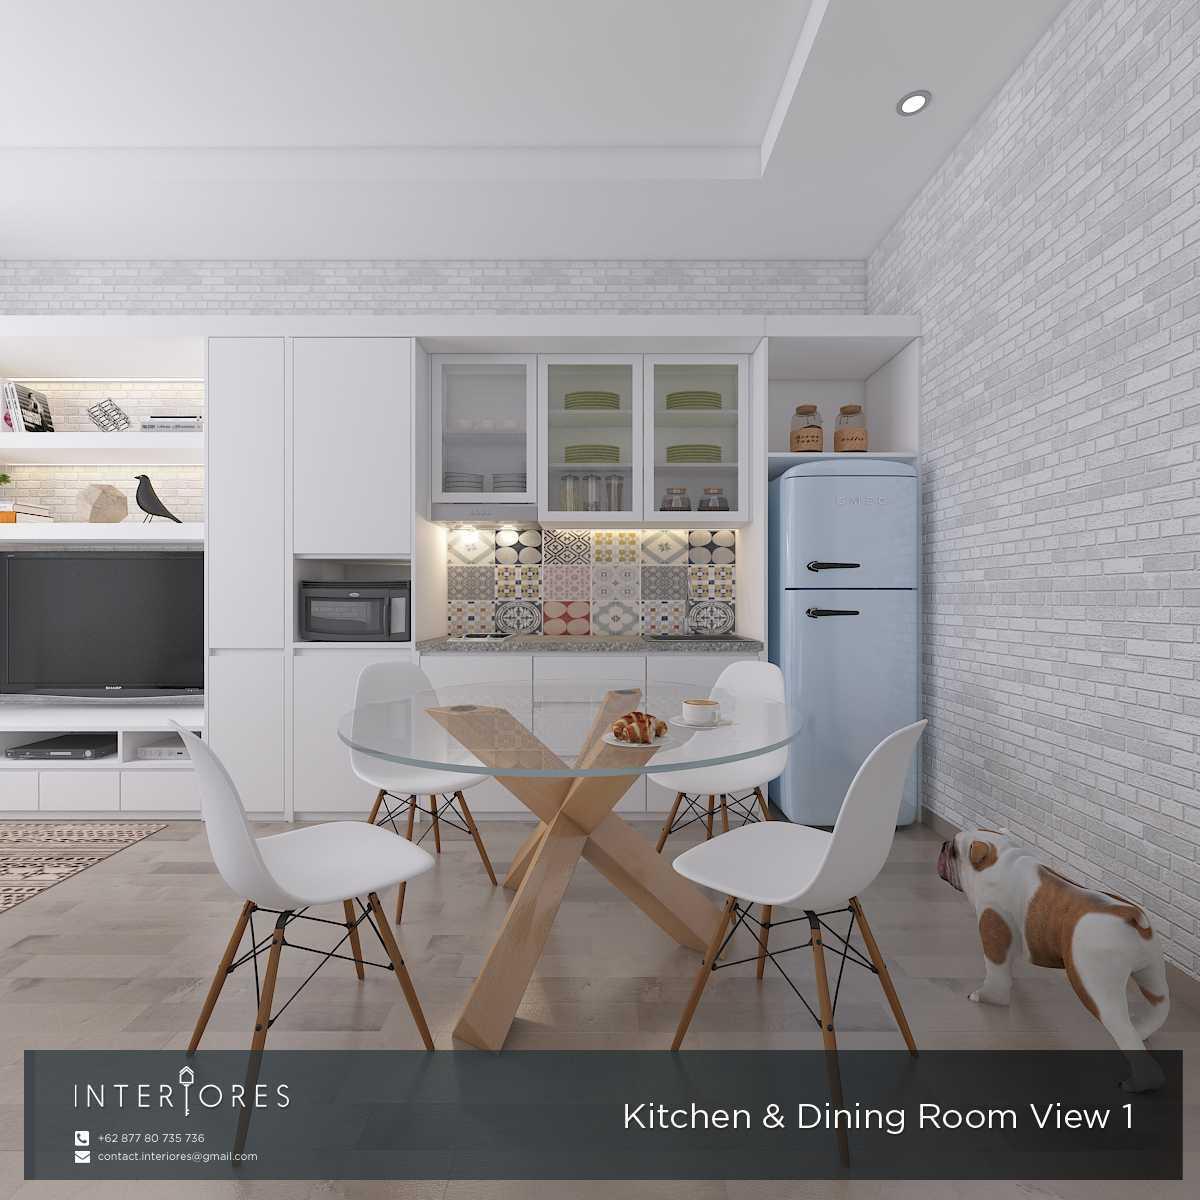 Interiores Interior Consultant & Build P. Scandi Pejaten Pejaten Kitchen & Dining Room Modern,skandinavia 17962